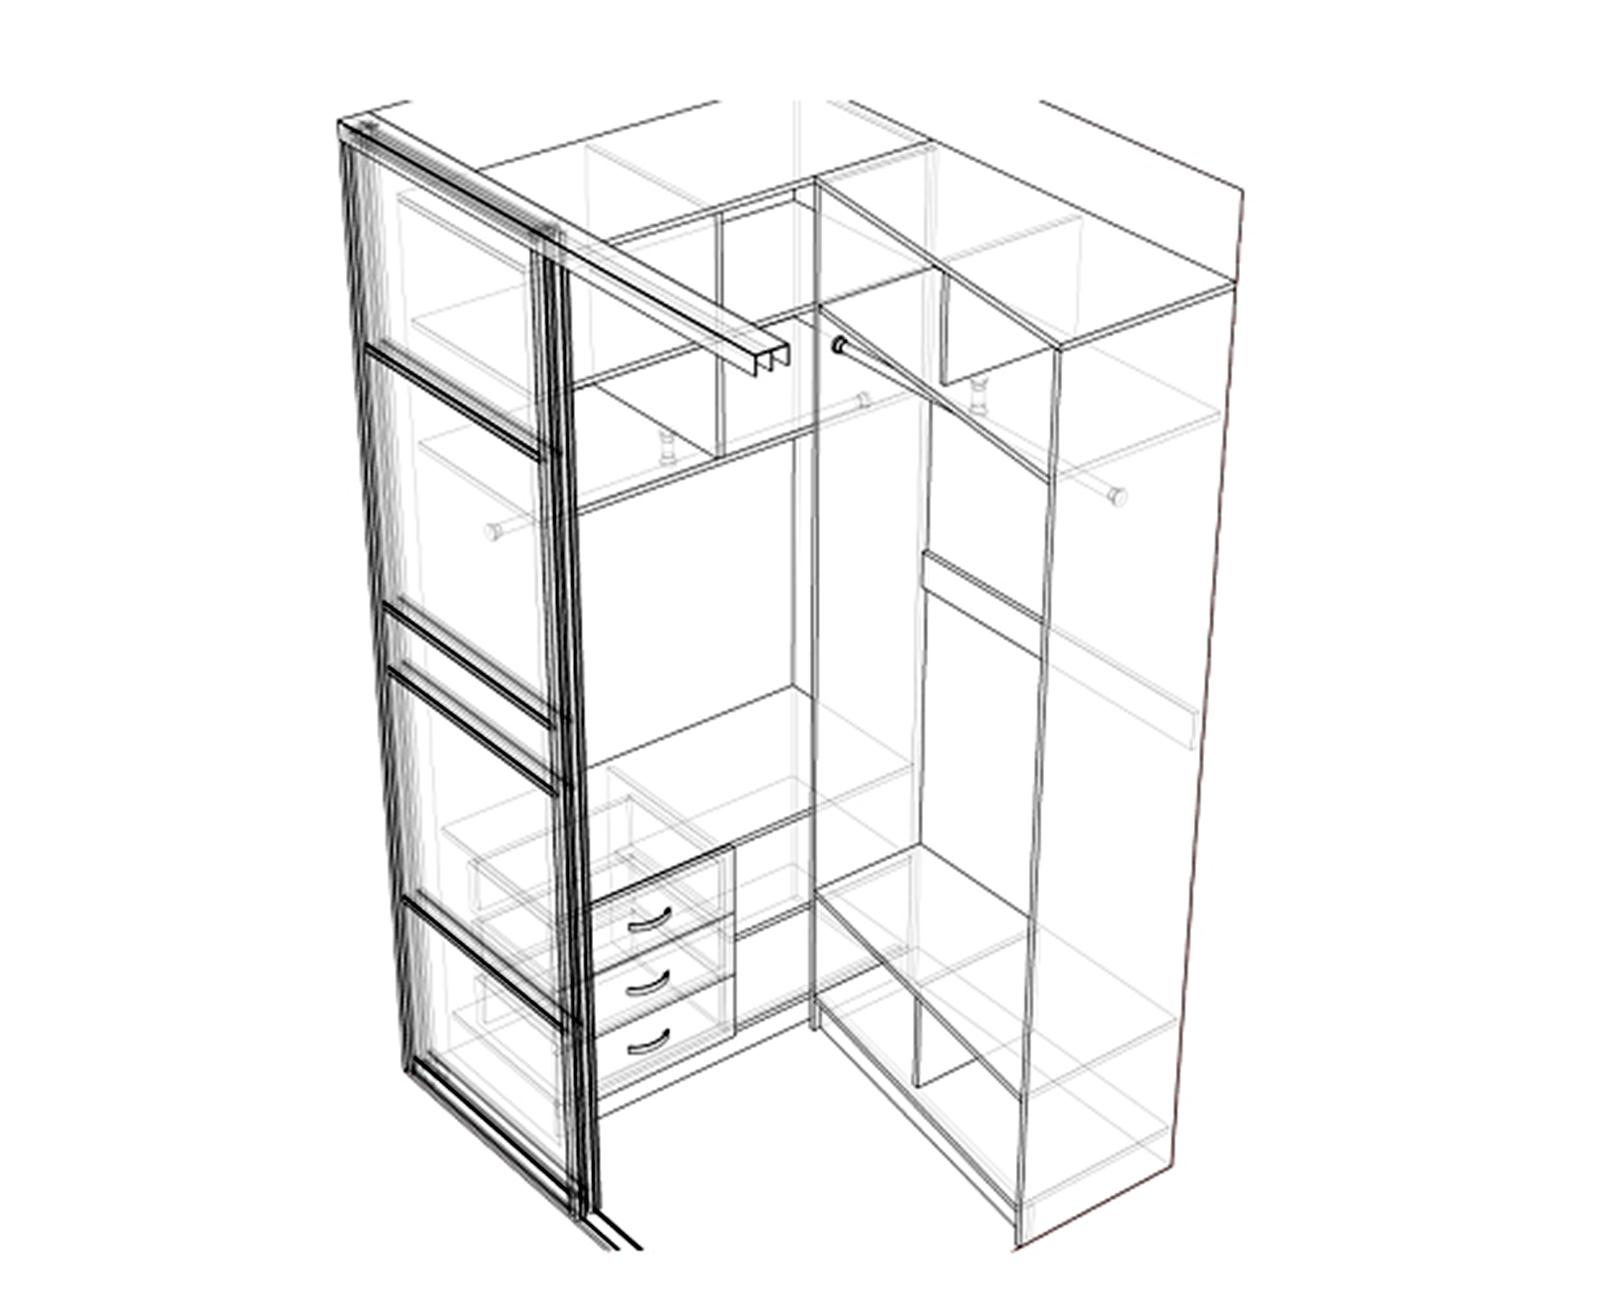 Чертеж шкафа из гипсокартона